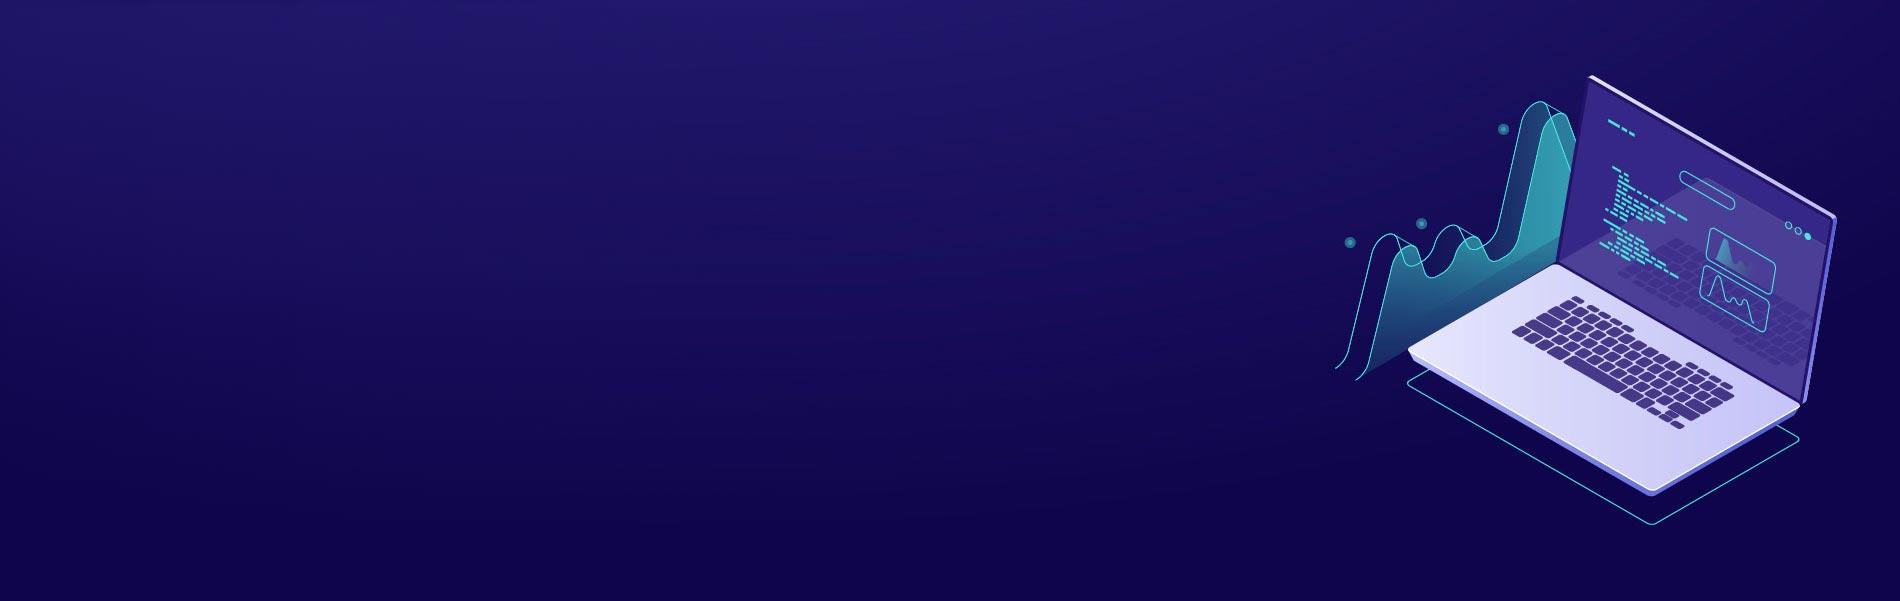 изображение веб аналитика сайтов